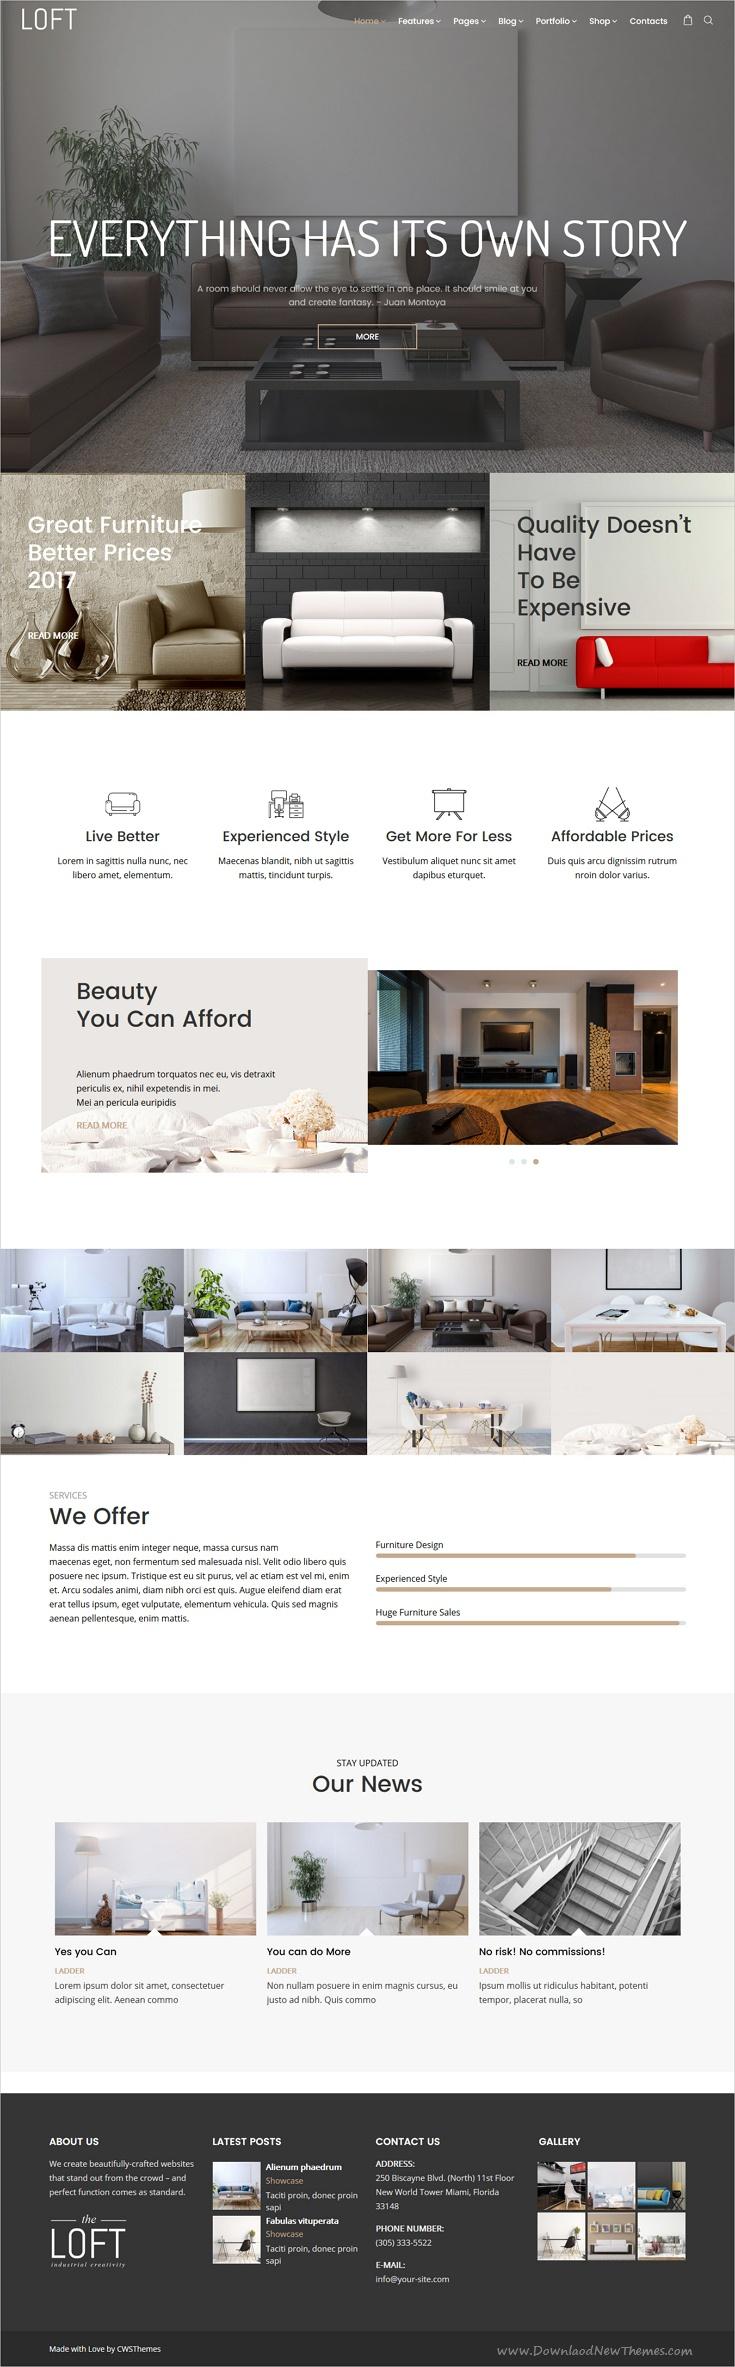 Loft - Interior Design WordPress Theme | Pinterest | Loft interior ...